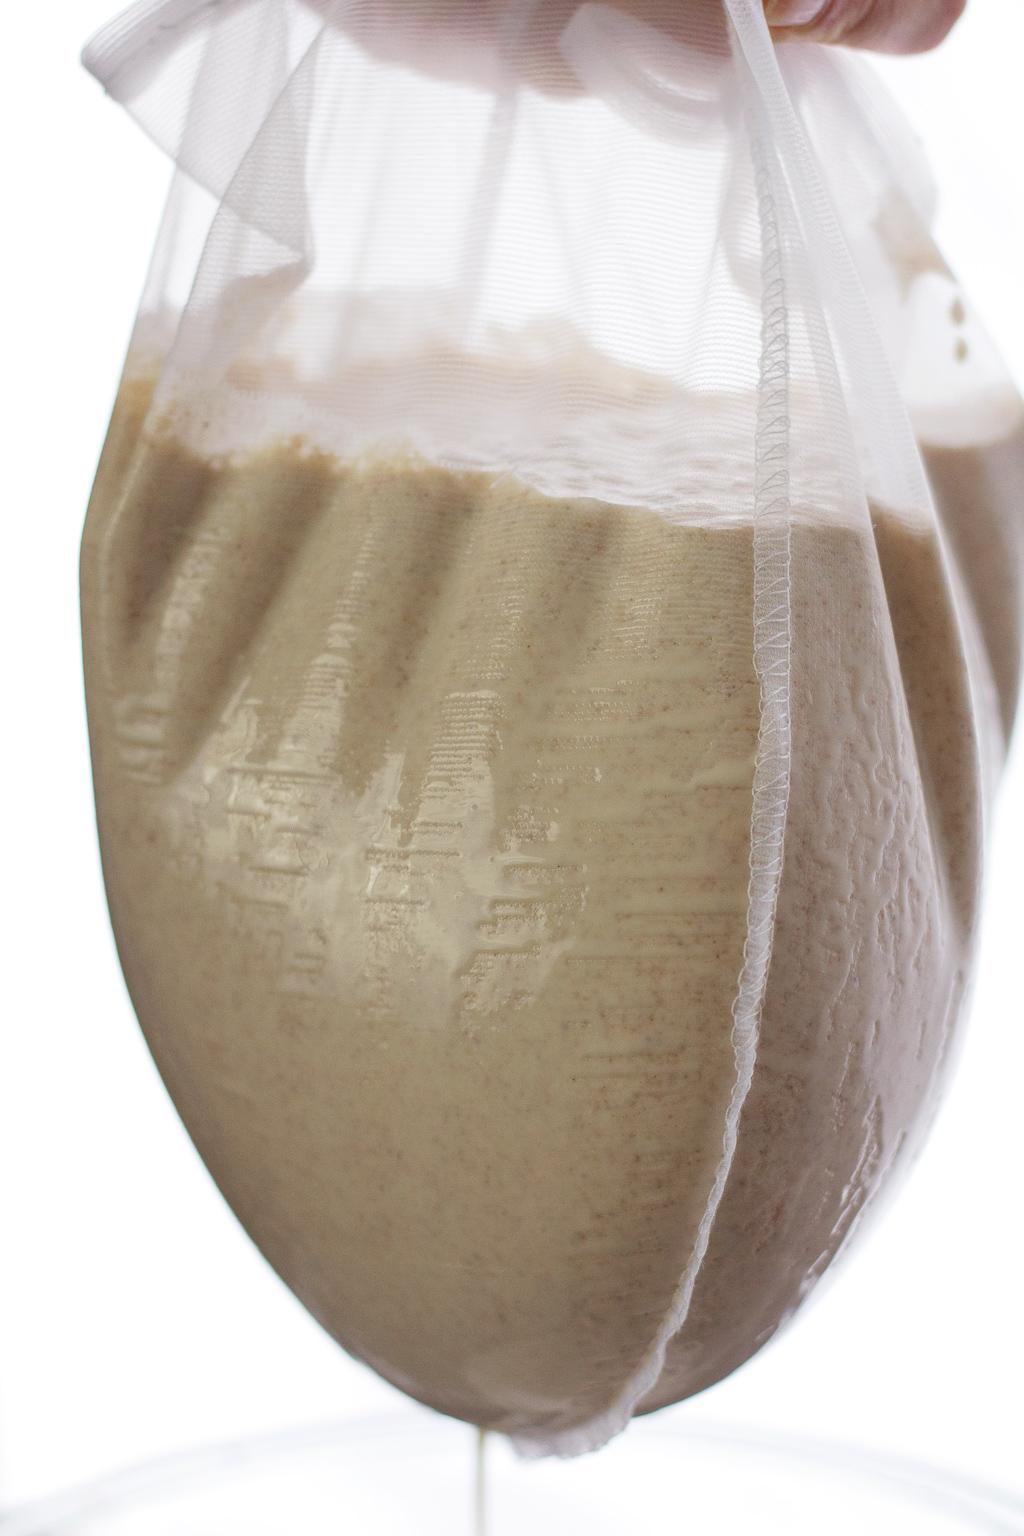 How to Make Nut Milk with Vitamix Cashew  Almond Milk